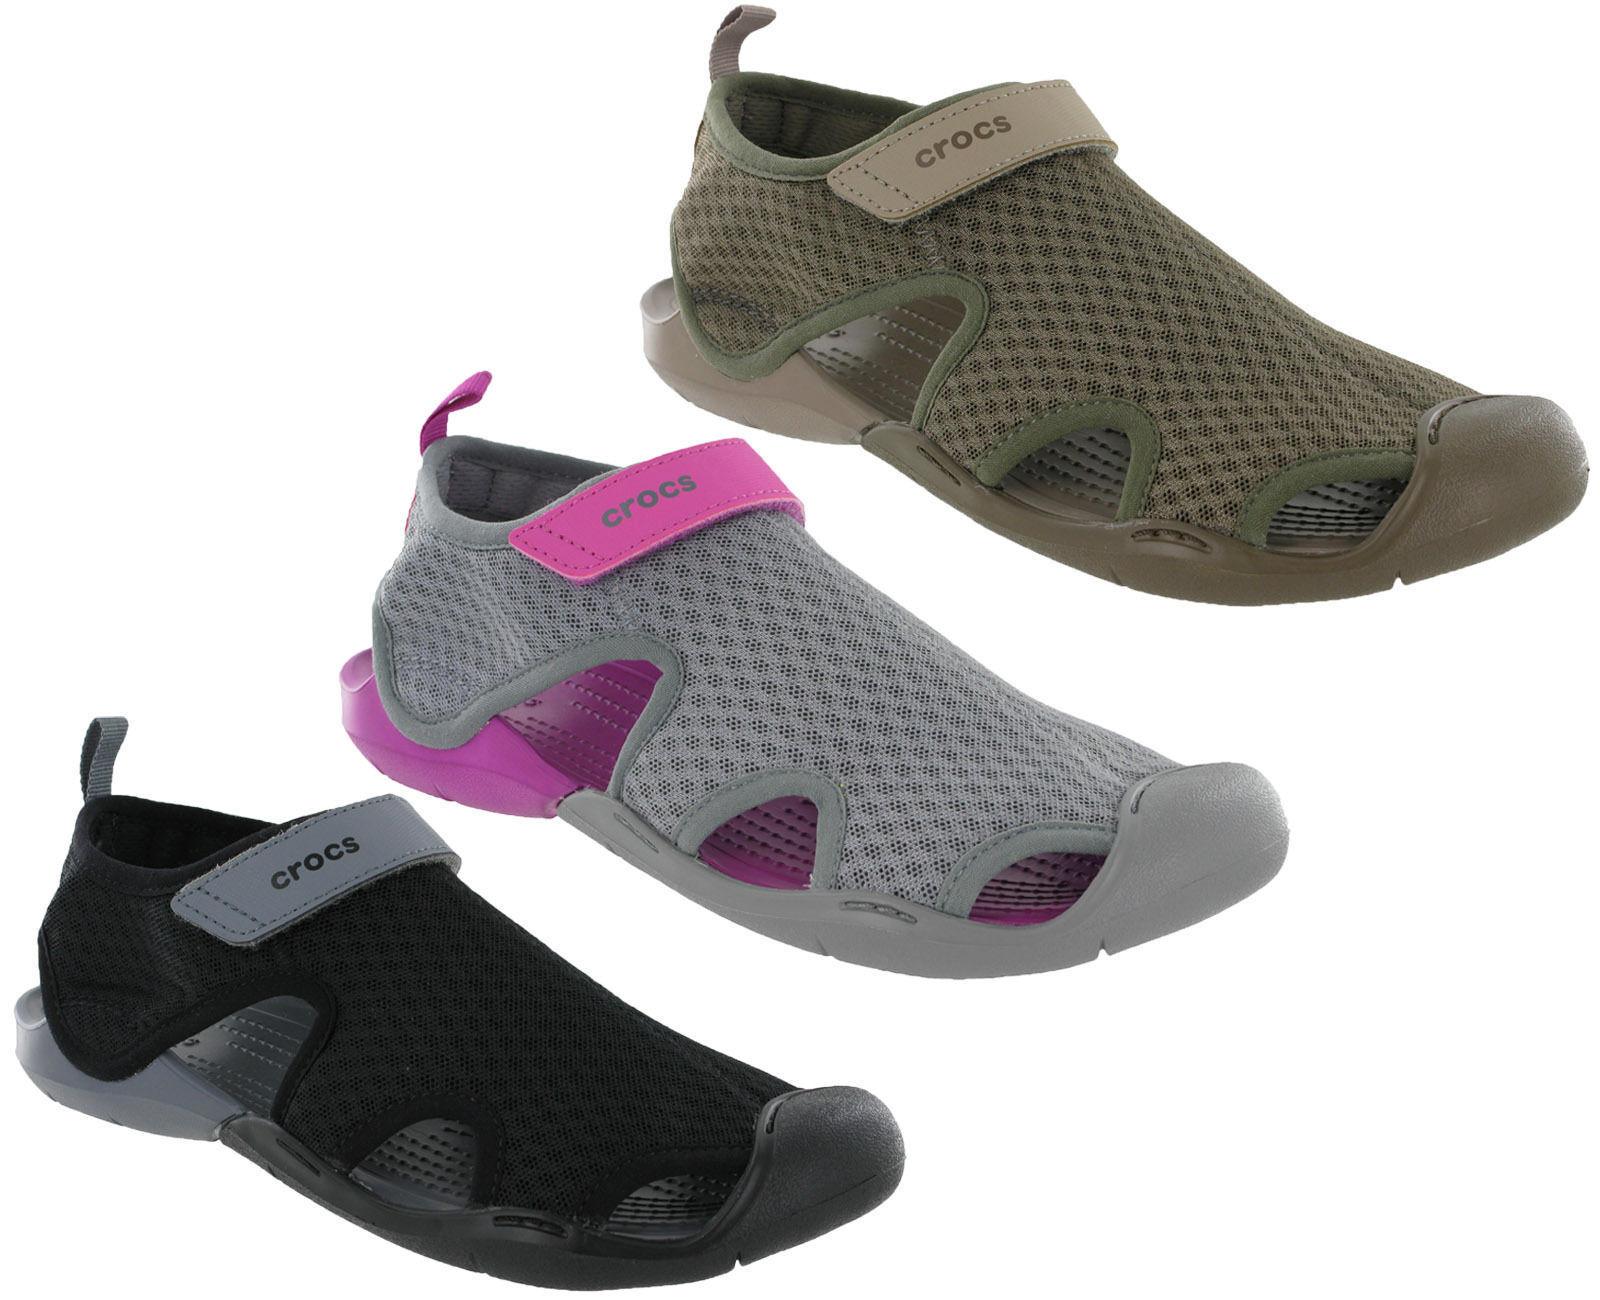 Crocs Swiftwater Sandale Damen Strand Netz Sommer Urlaub flach Sea Schuhe